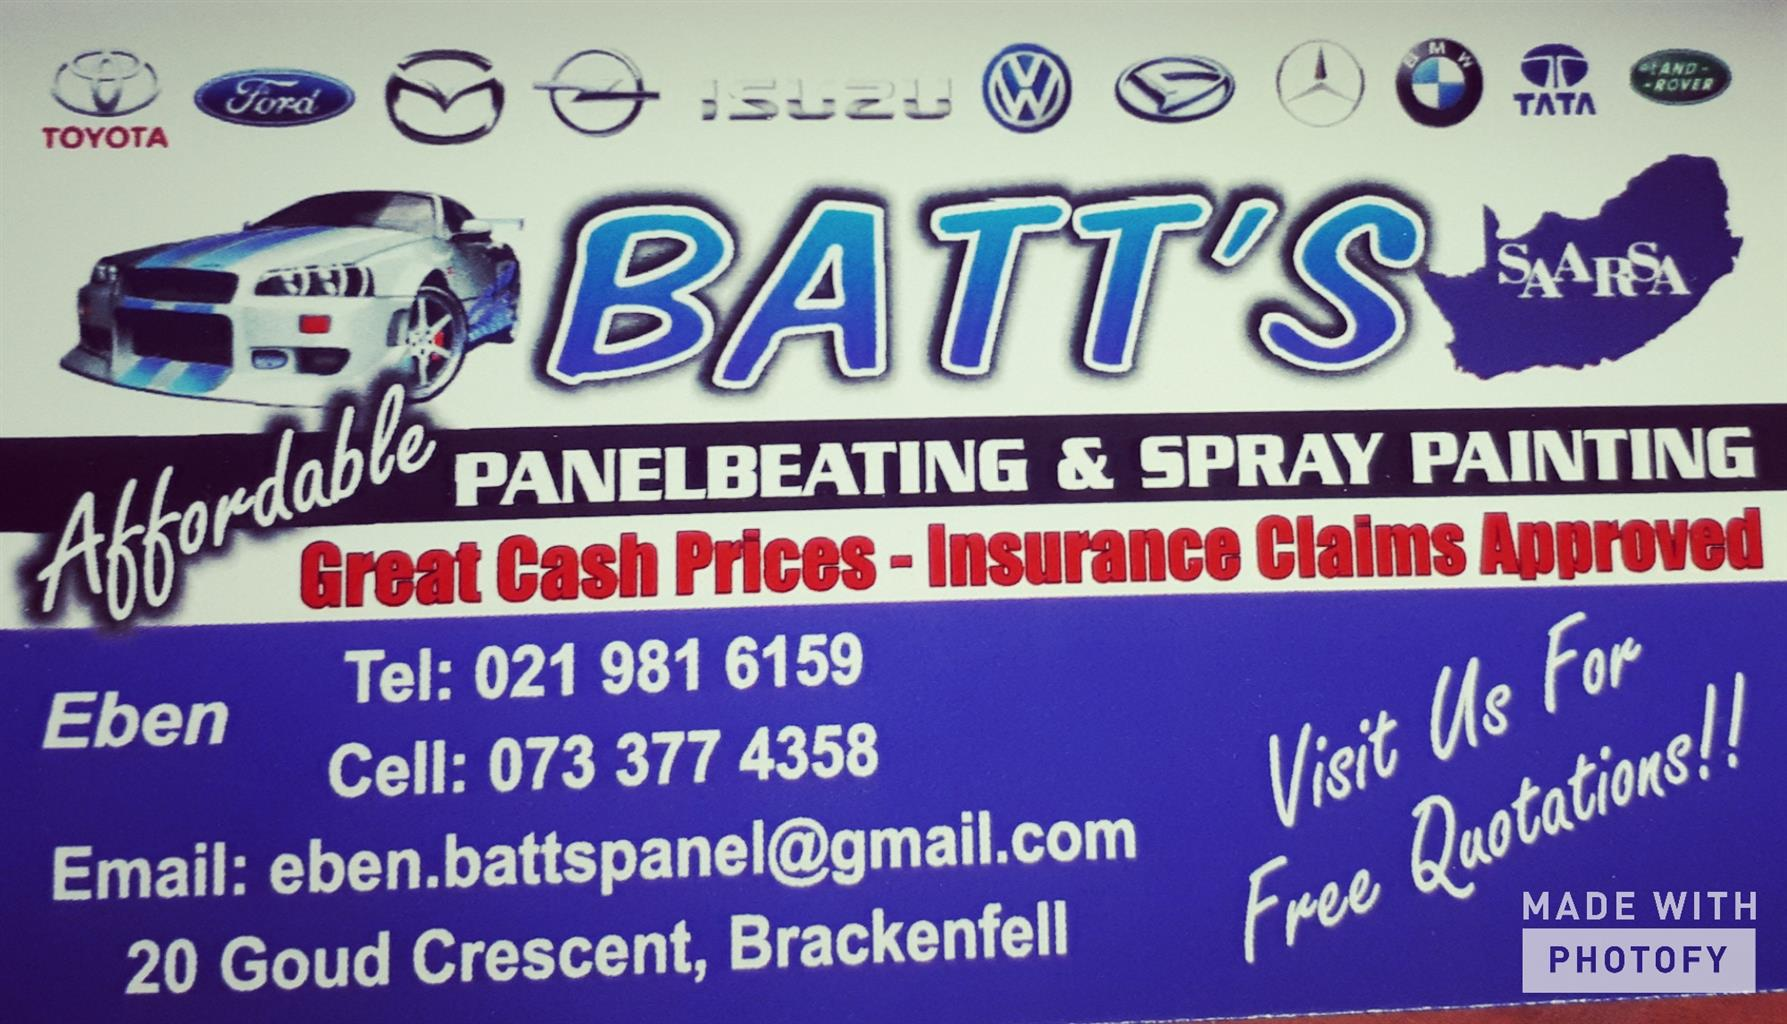 "Batt""s Panelbeaters"